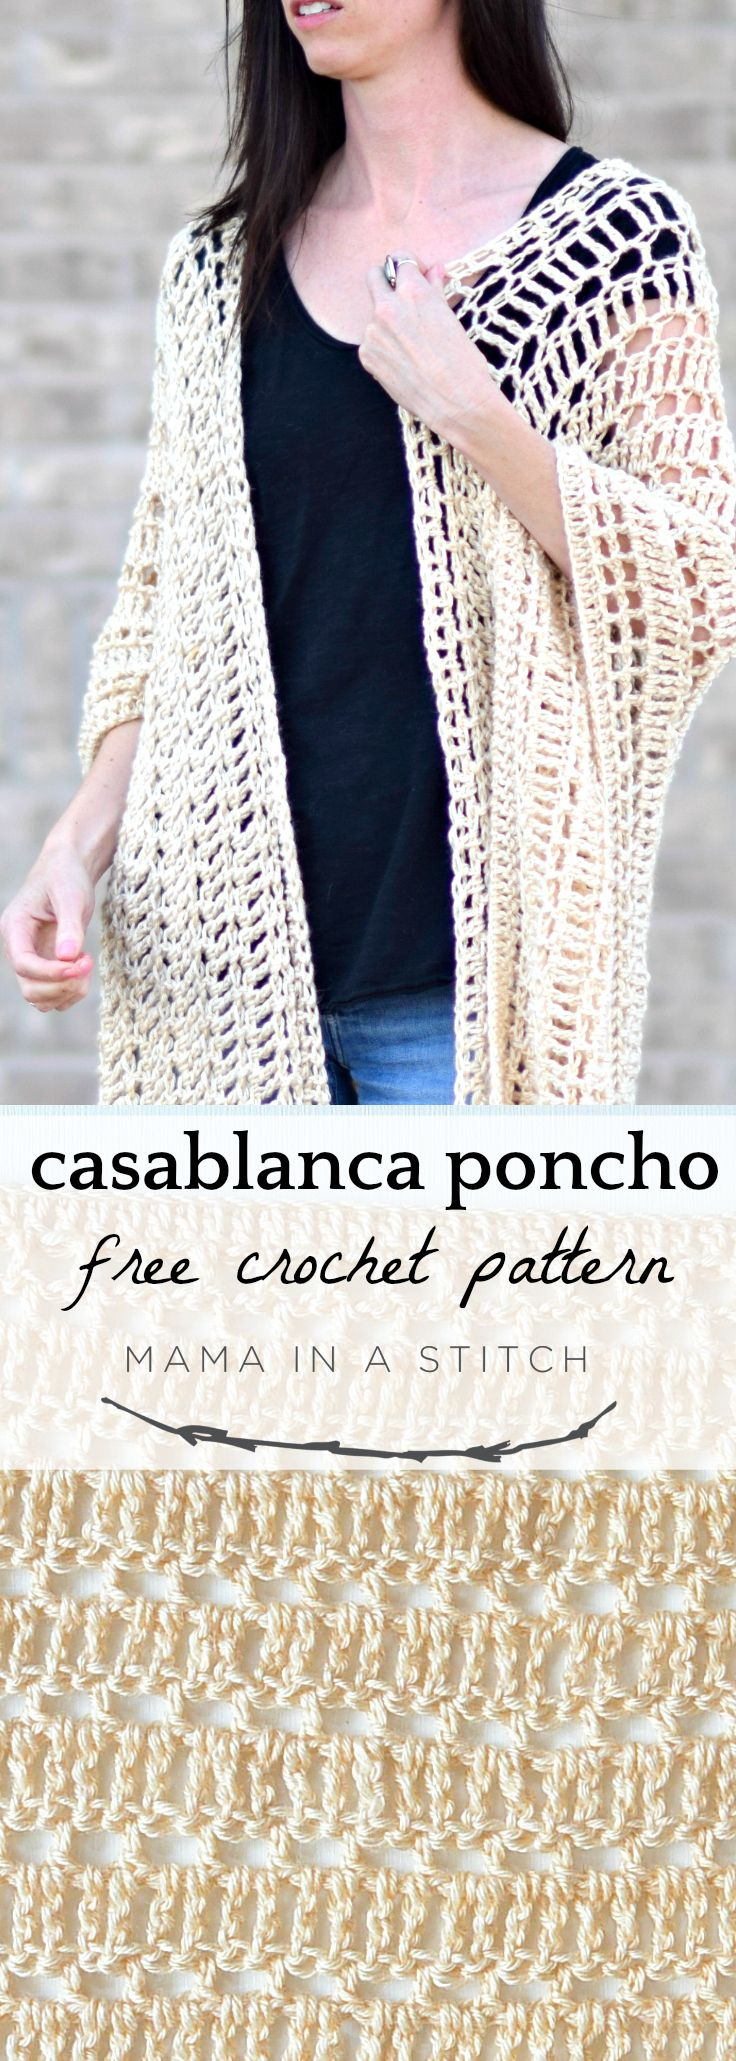 Casablanca Summer Poncho Crochet Pattern | haciky | Pinterest ...